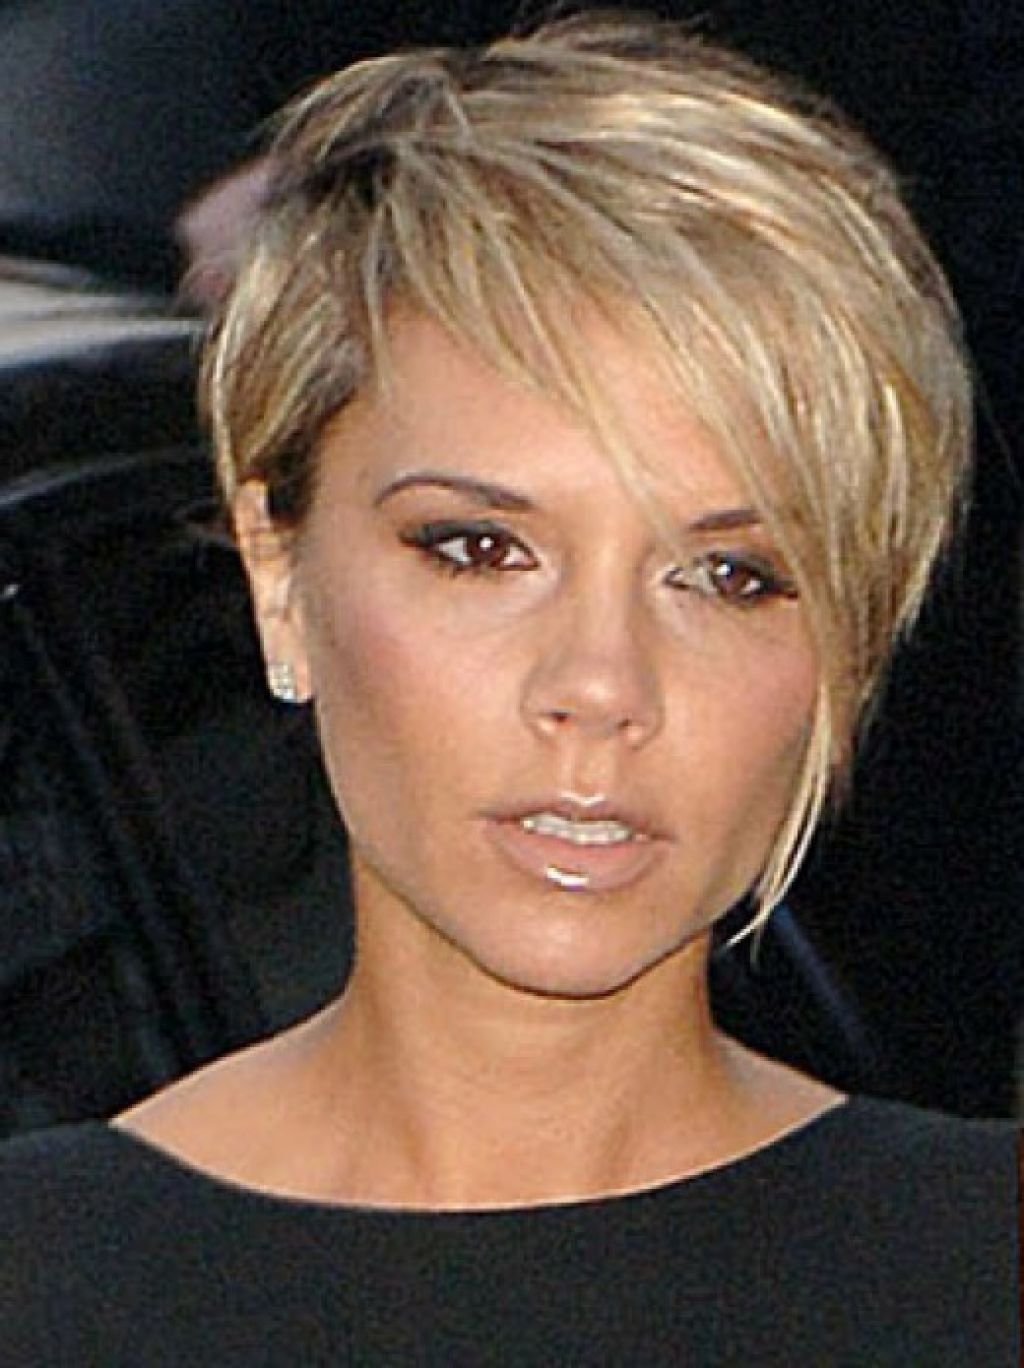 victoria beckham pixie cut blonde google search diy hair care pinterest pixie cut. Black Bedroom Furniture Sets. Home Design Ideas